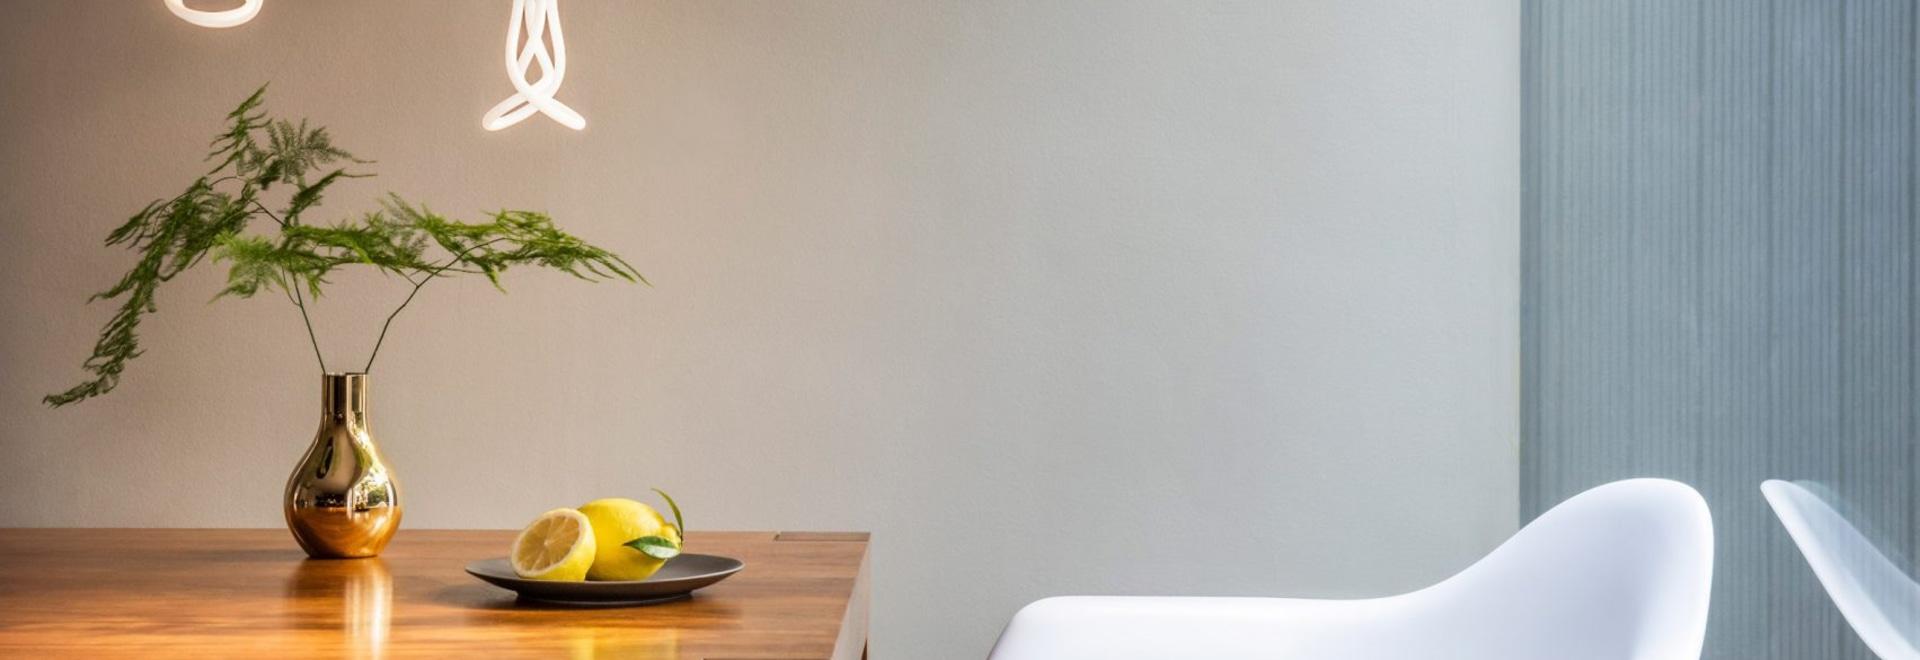 Plumen creates LED version of Design of the Year-winning 001 light bulb